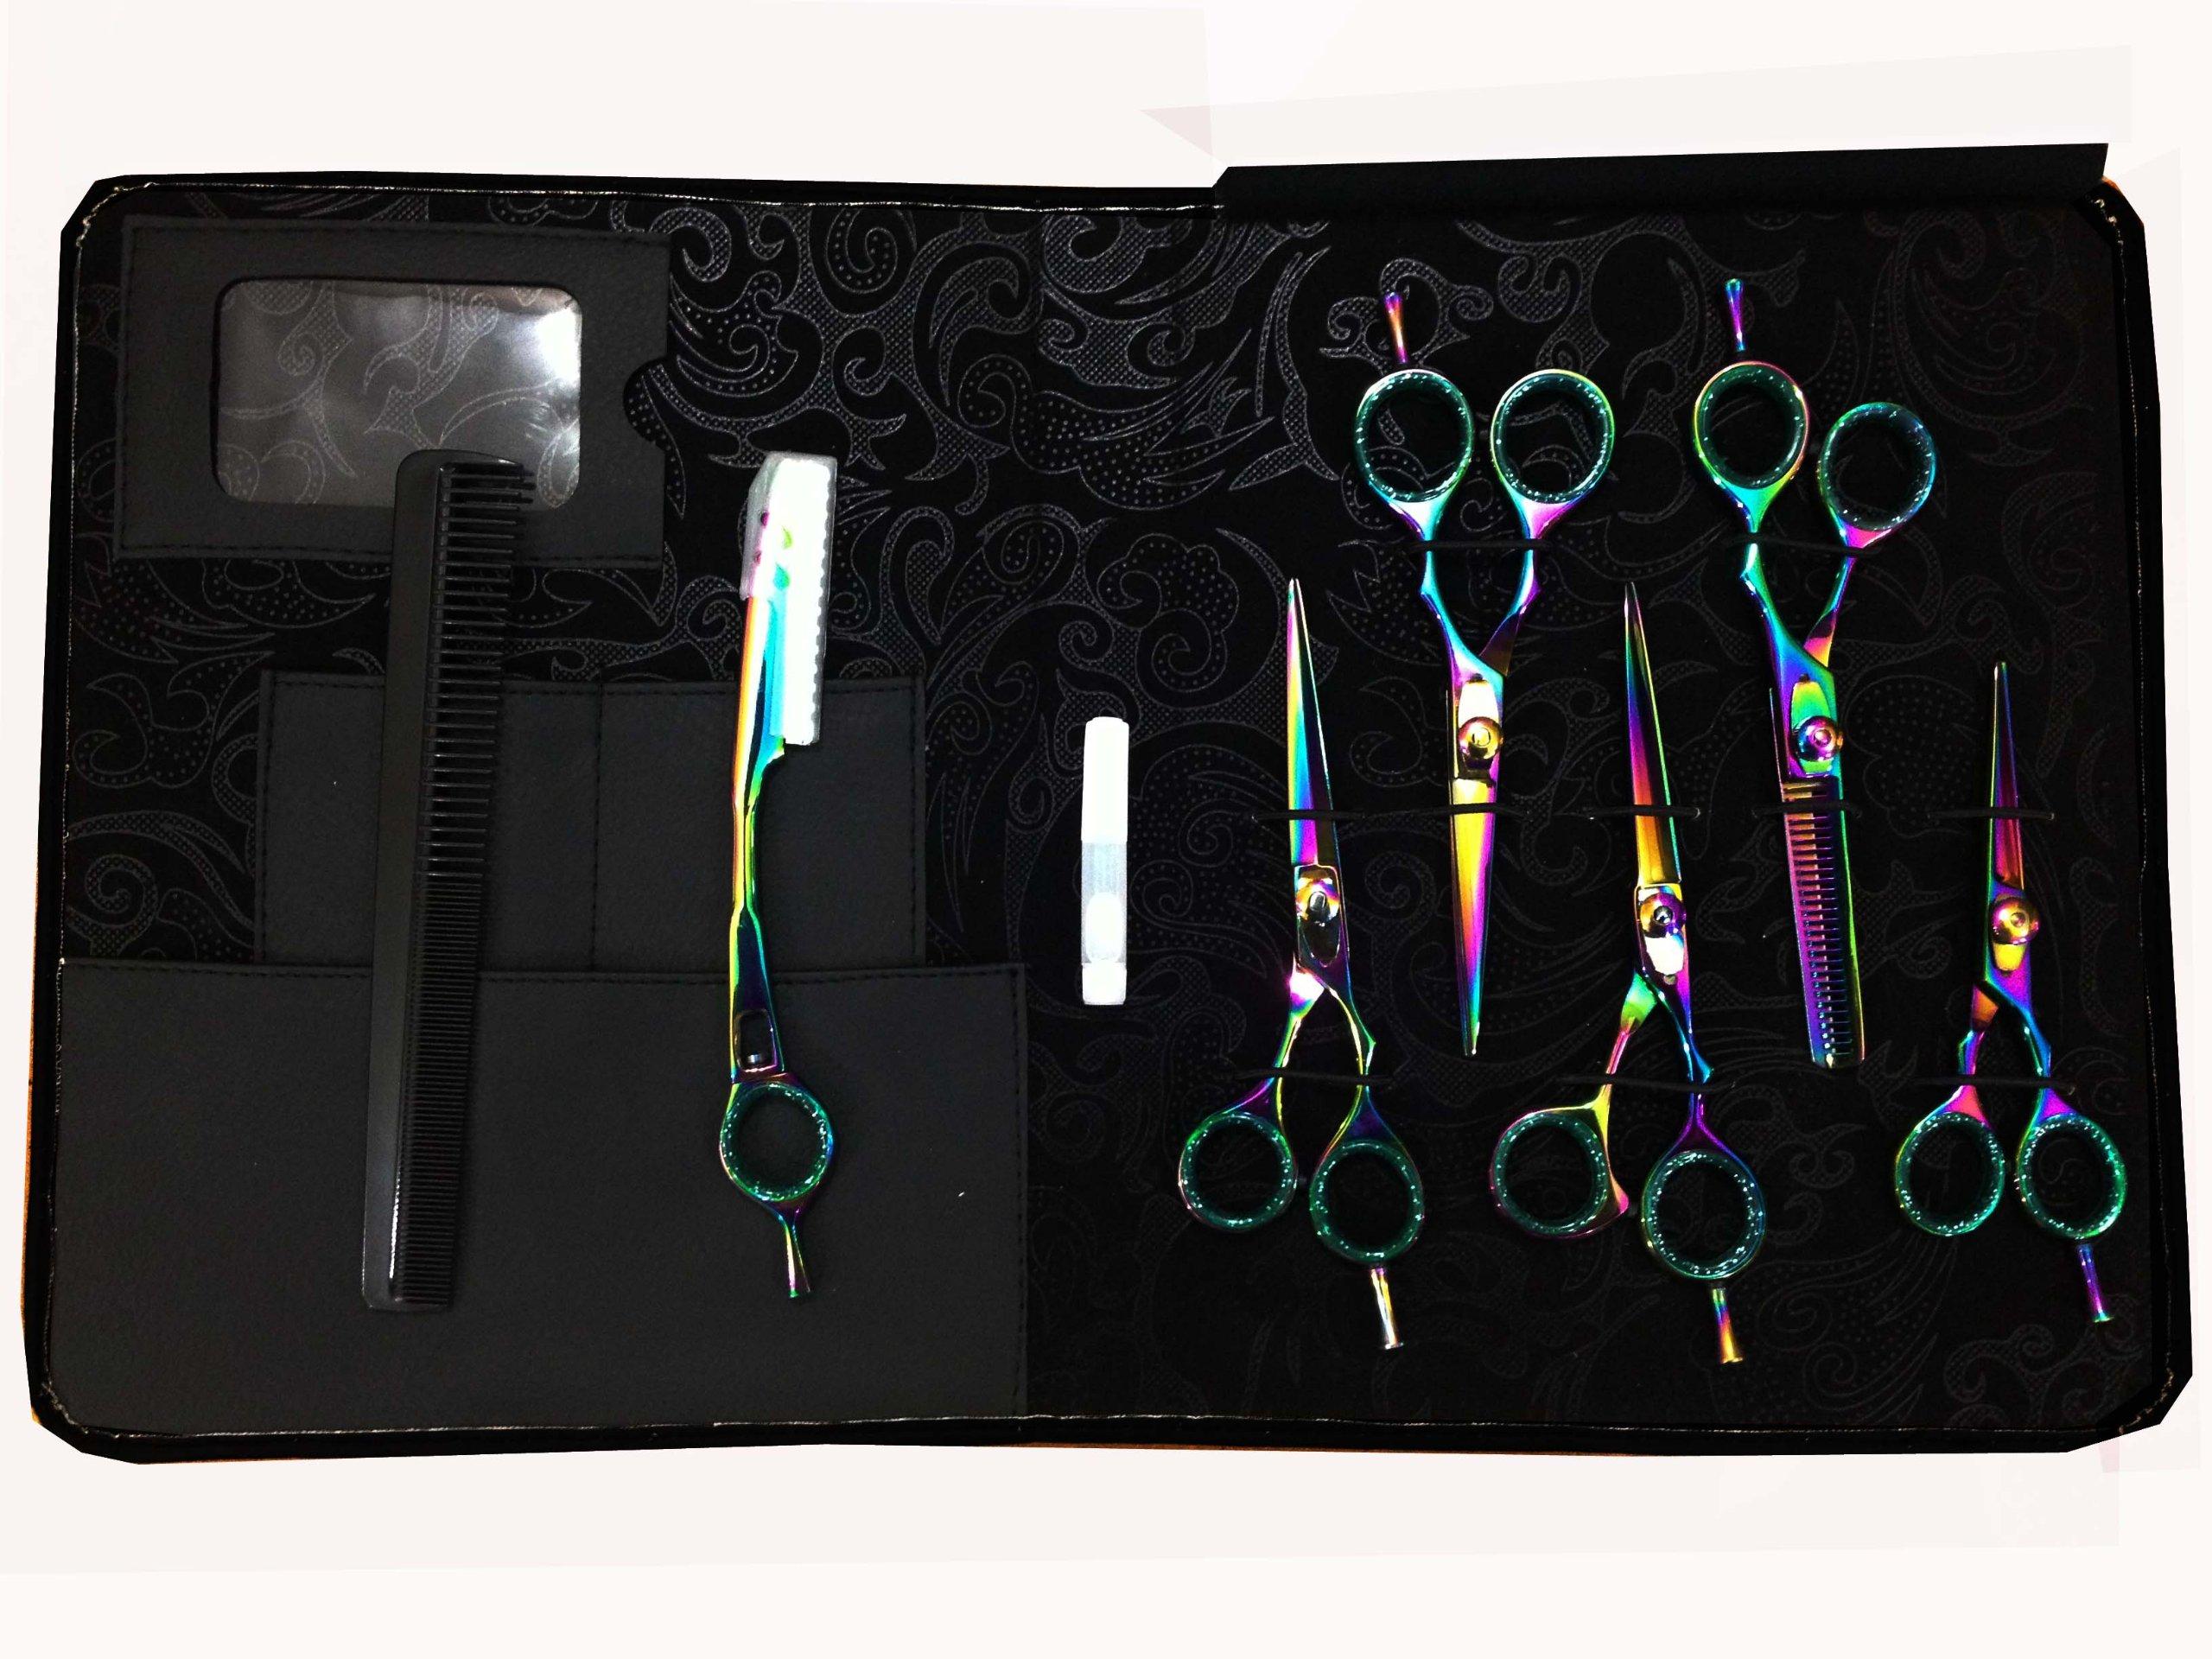 ZZZRT Multi Color (Complete Students & Barber Kit) Japanese J2 Stainless Steel Pro Razor edge Barber Hair cutting scissors shears Barber Thinning Scissors Shears And Hair Thinning Razor with Comb + Free scissors Lubricant & scissors insert rings by ZZZRT traders